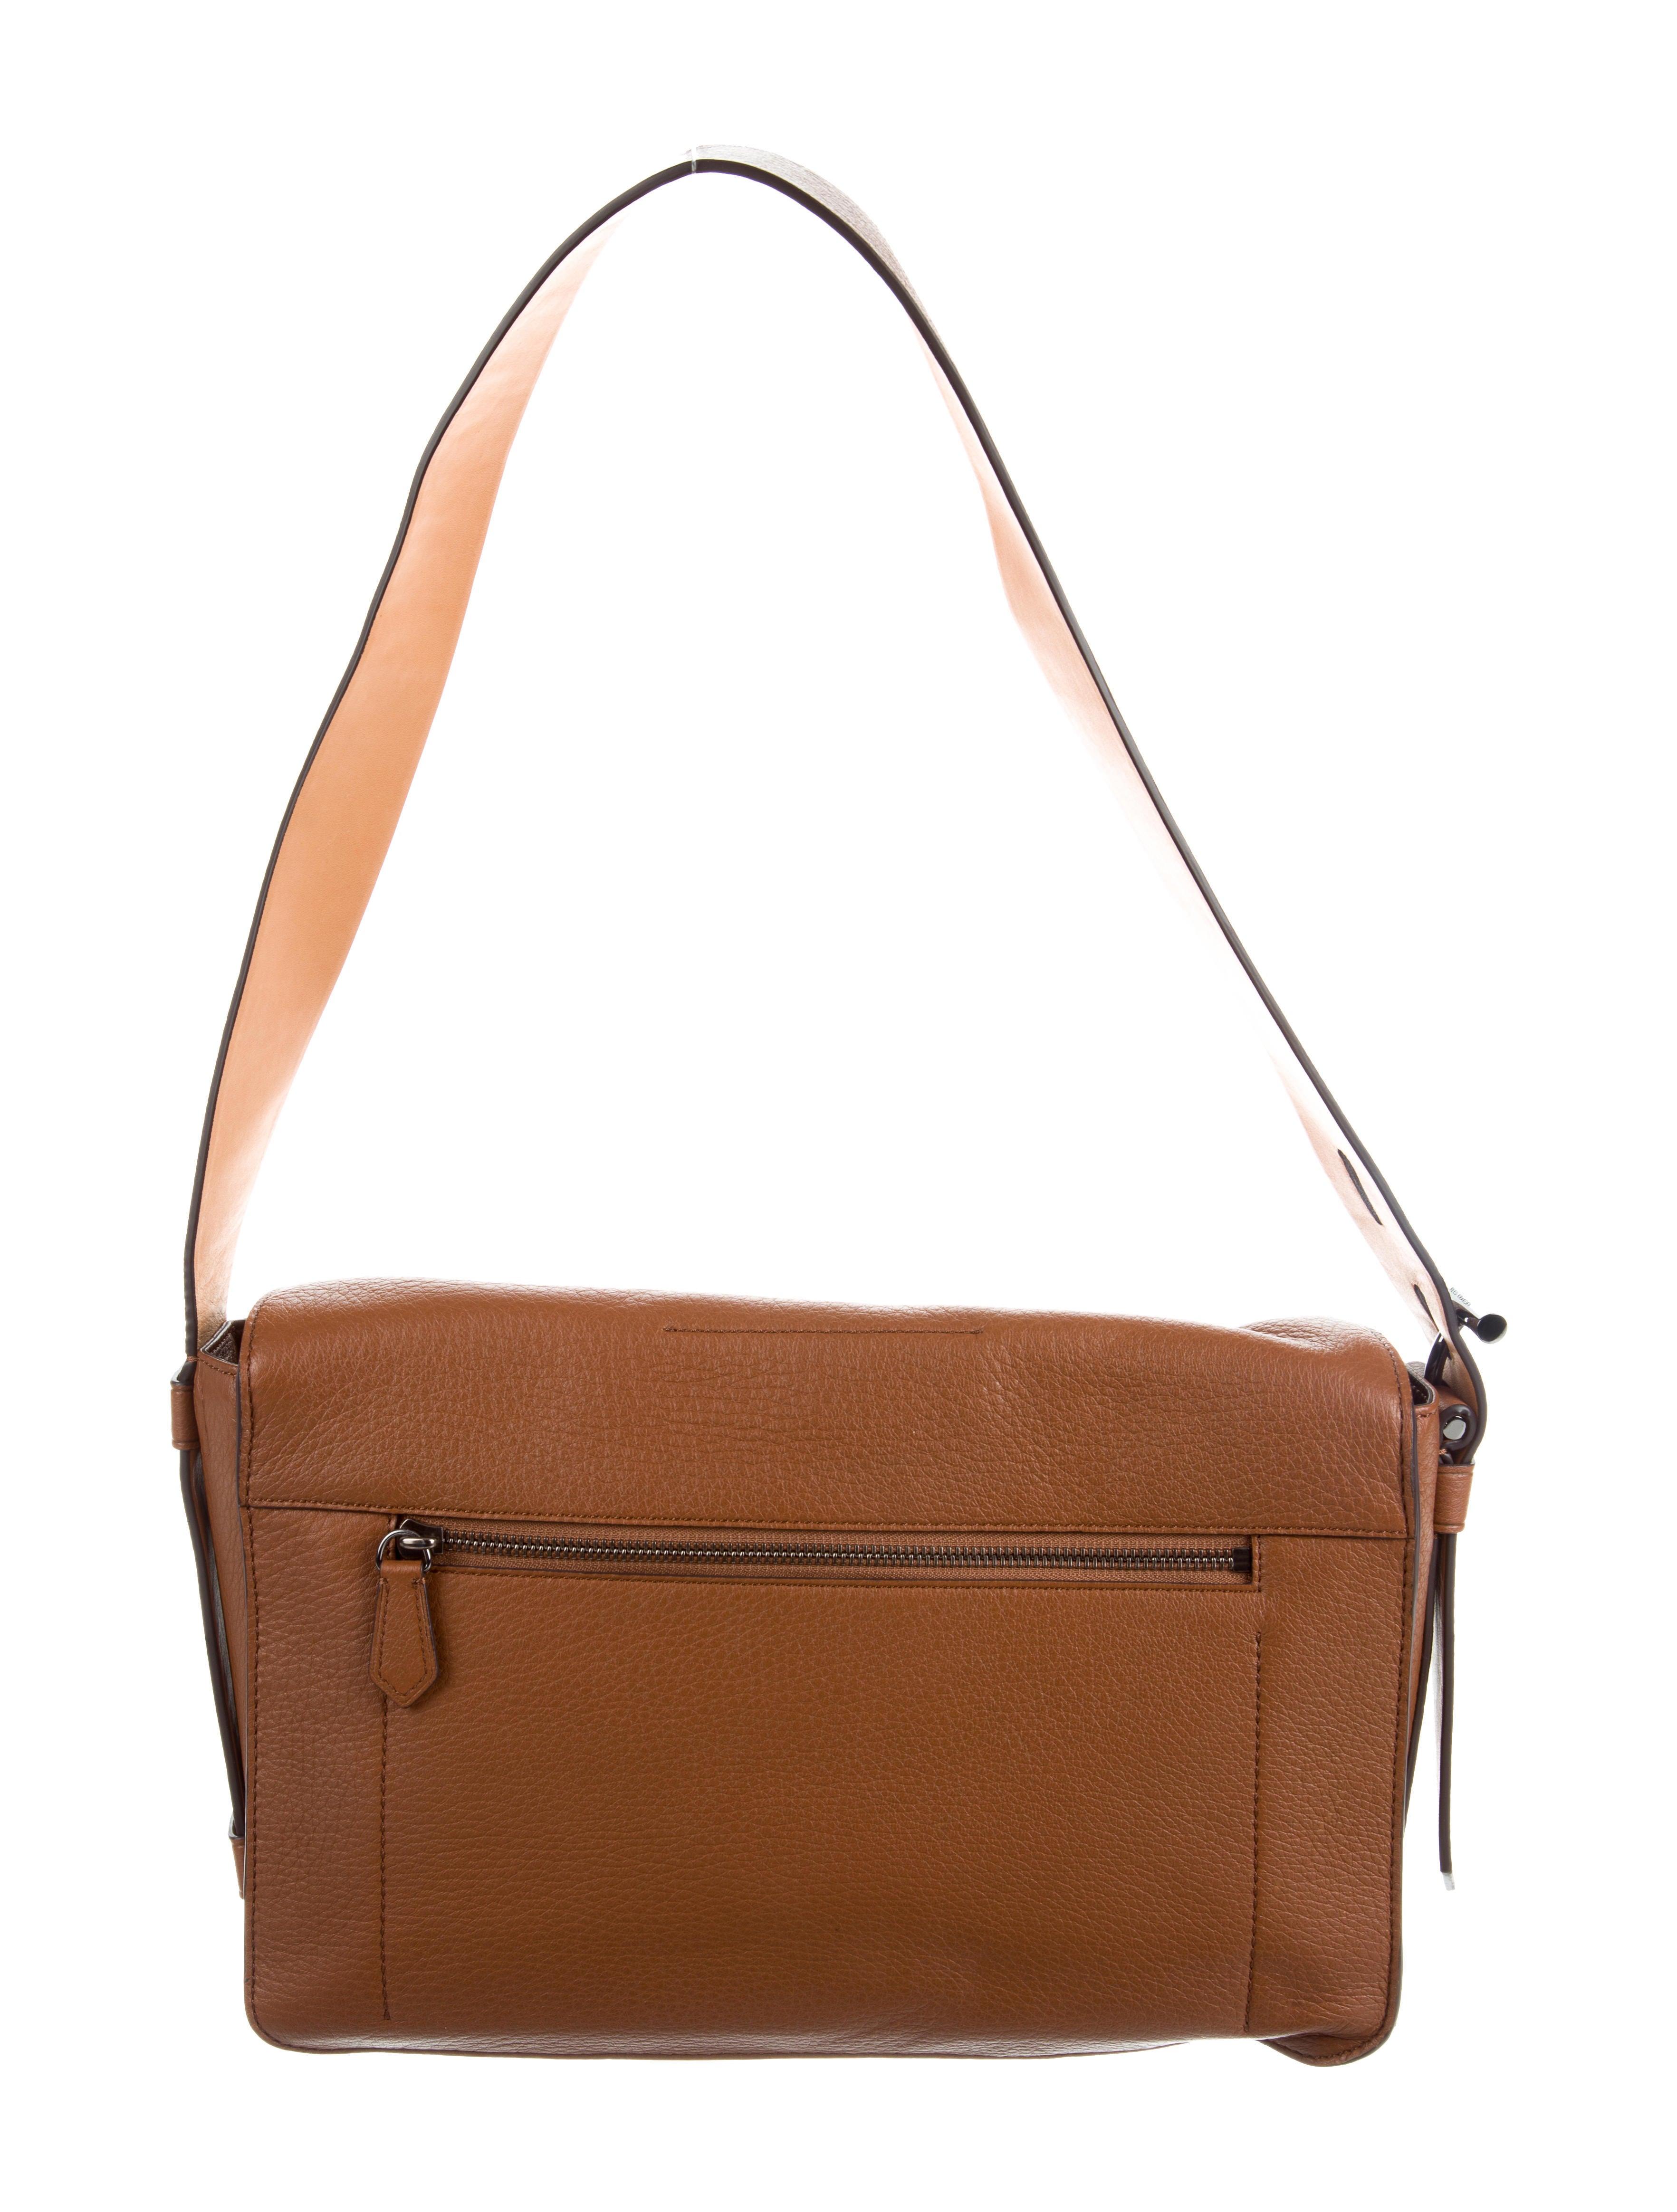 Reed Krakoff Standard Messenger Bag Handbags REE27825  : REE278254enlarged from www.therealreal.com size 3529 x 4656 jpeg 901kB